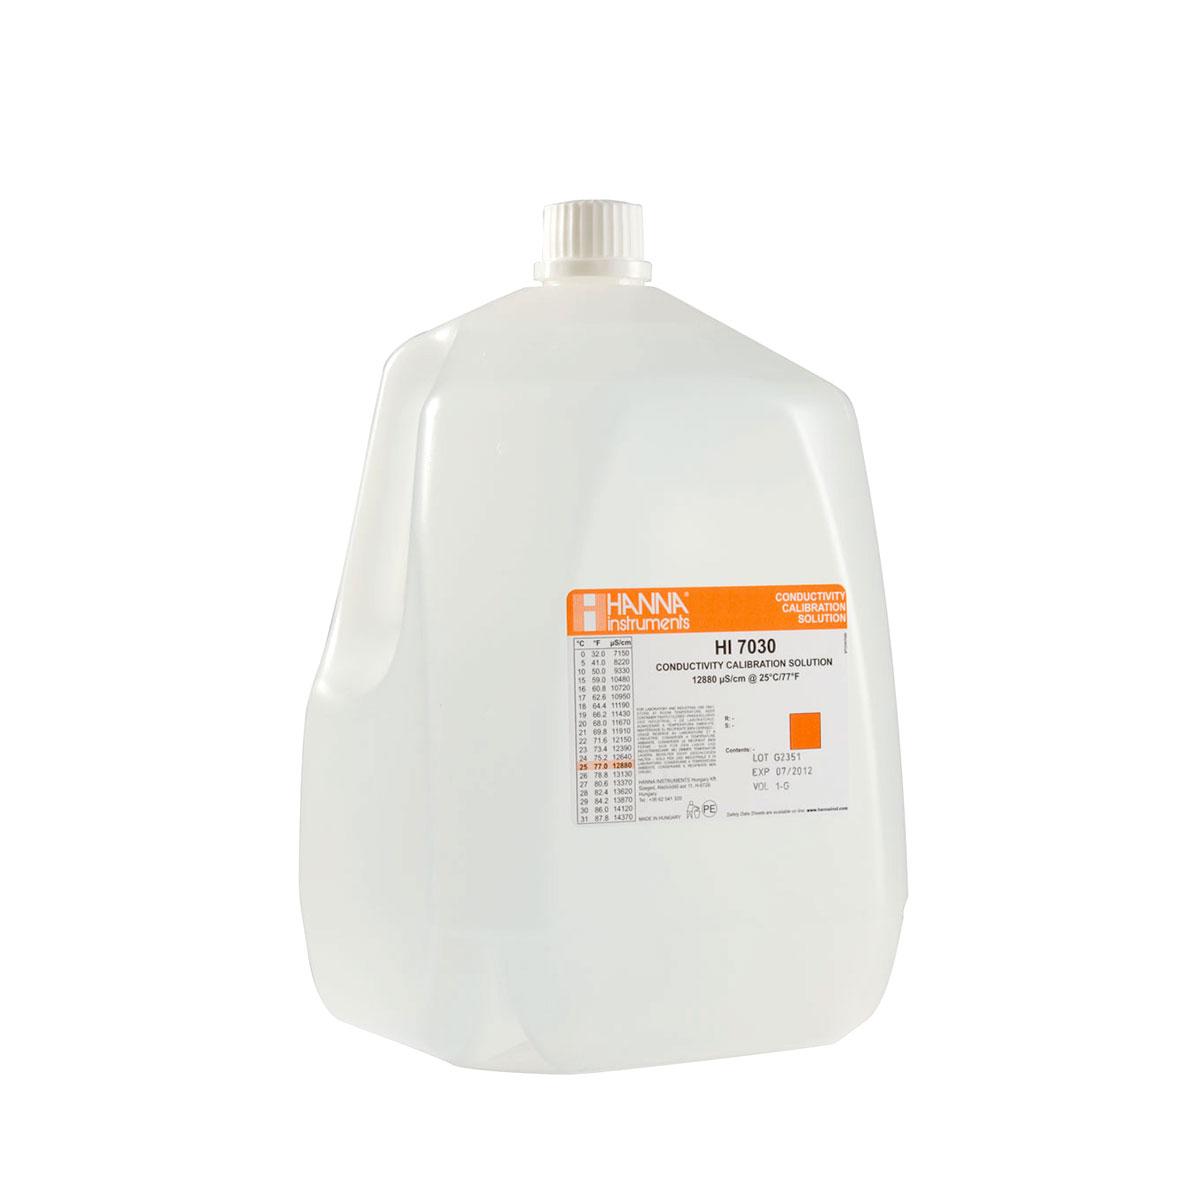 HI7030/1G 12880 µS/cm Conductivity Standard (1 Gallon)